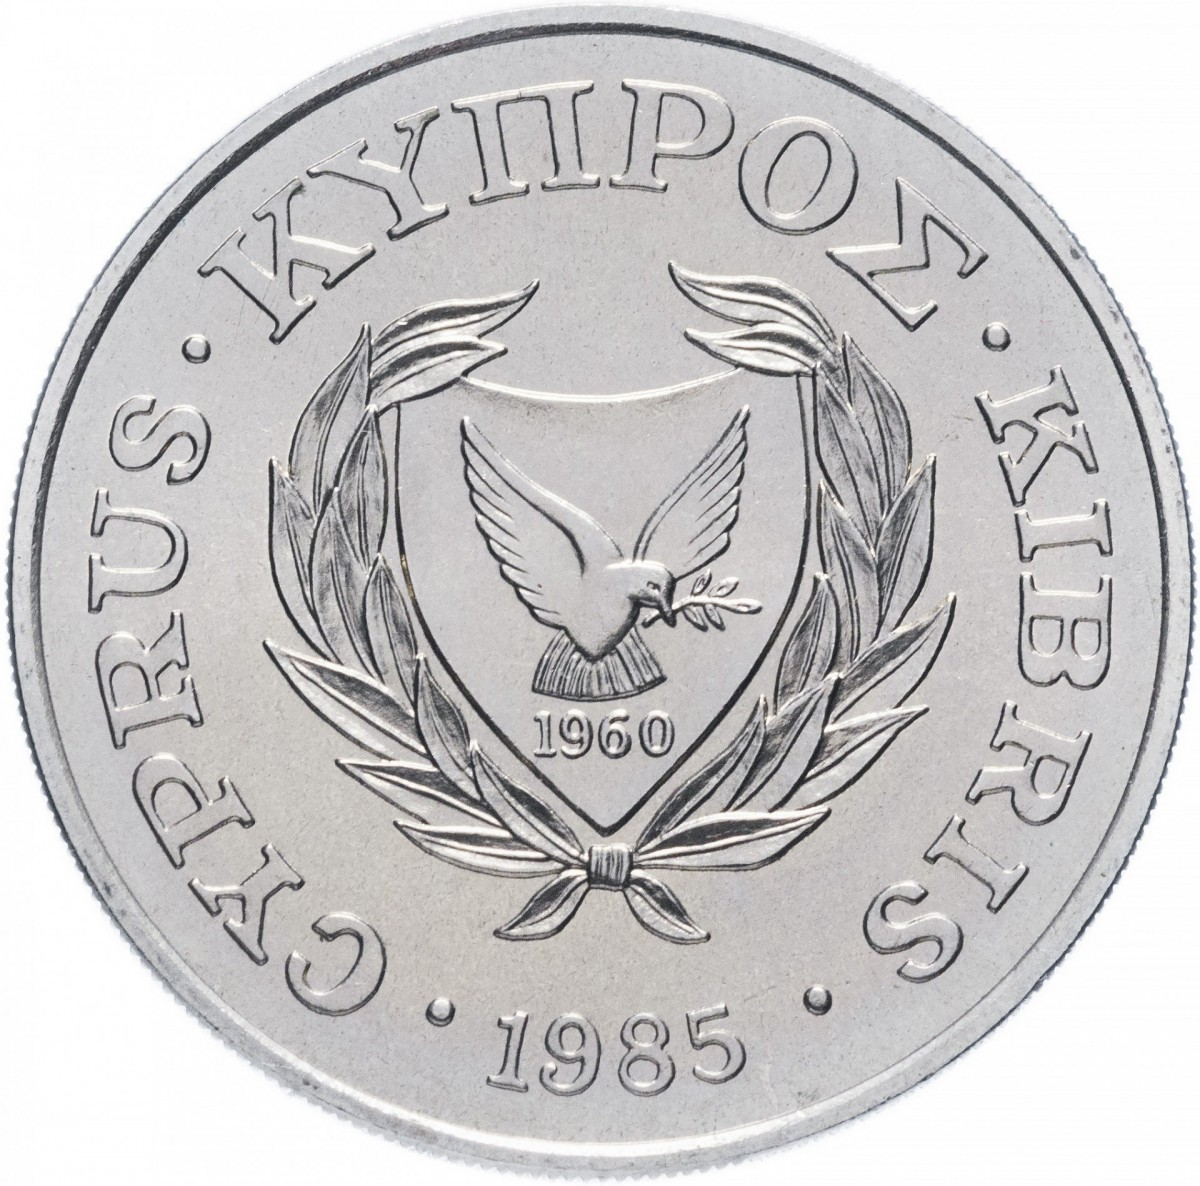 Кипр 50 центов 1985 года ФАО код 22336